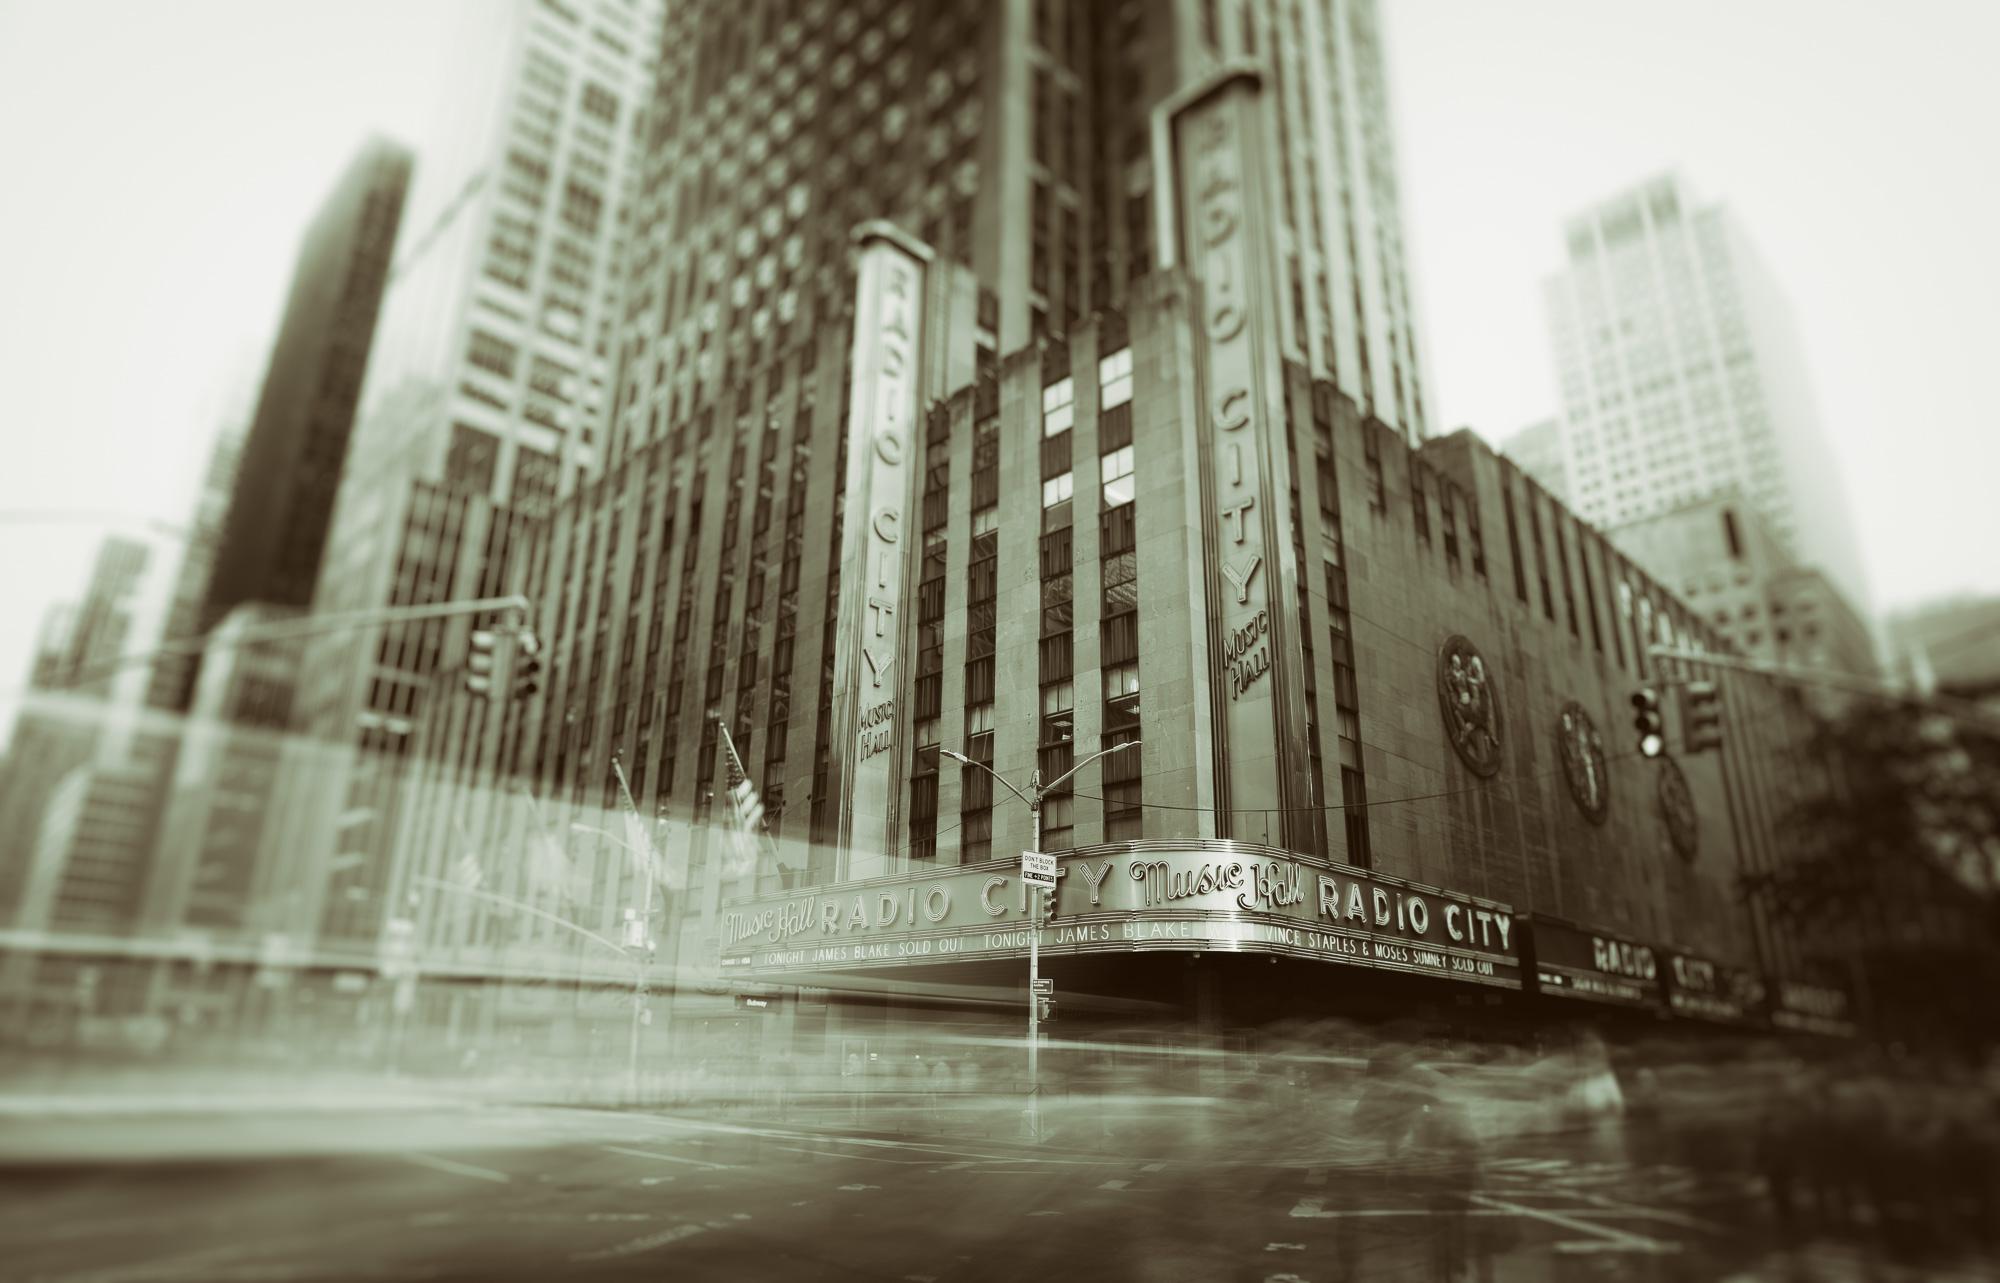 Radio City in monochromatic slow motion